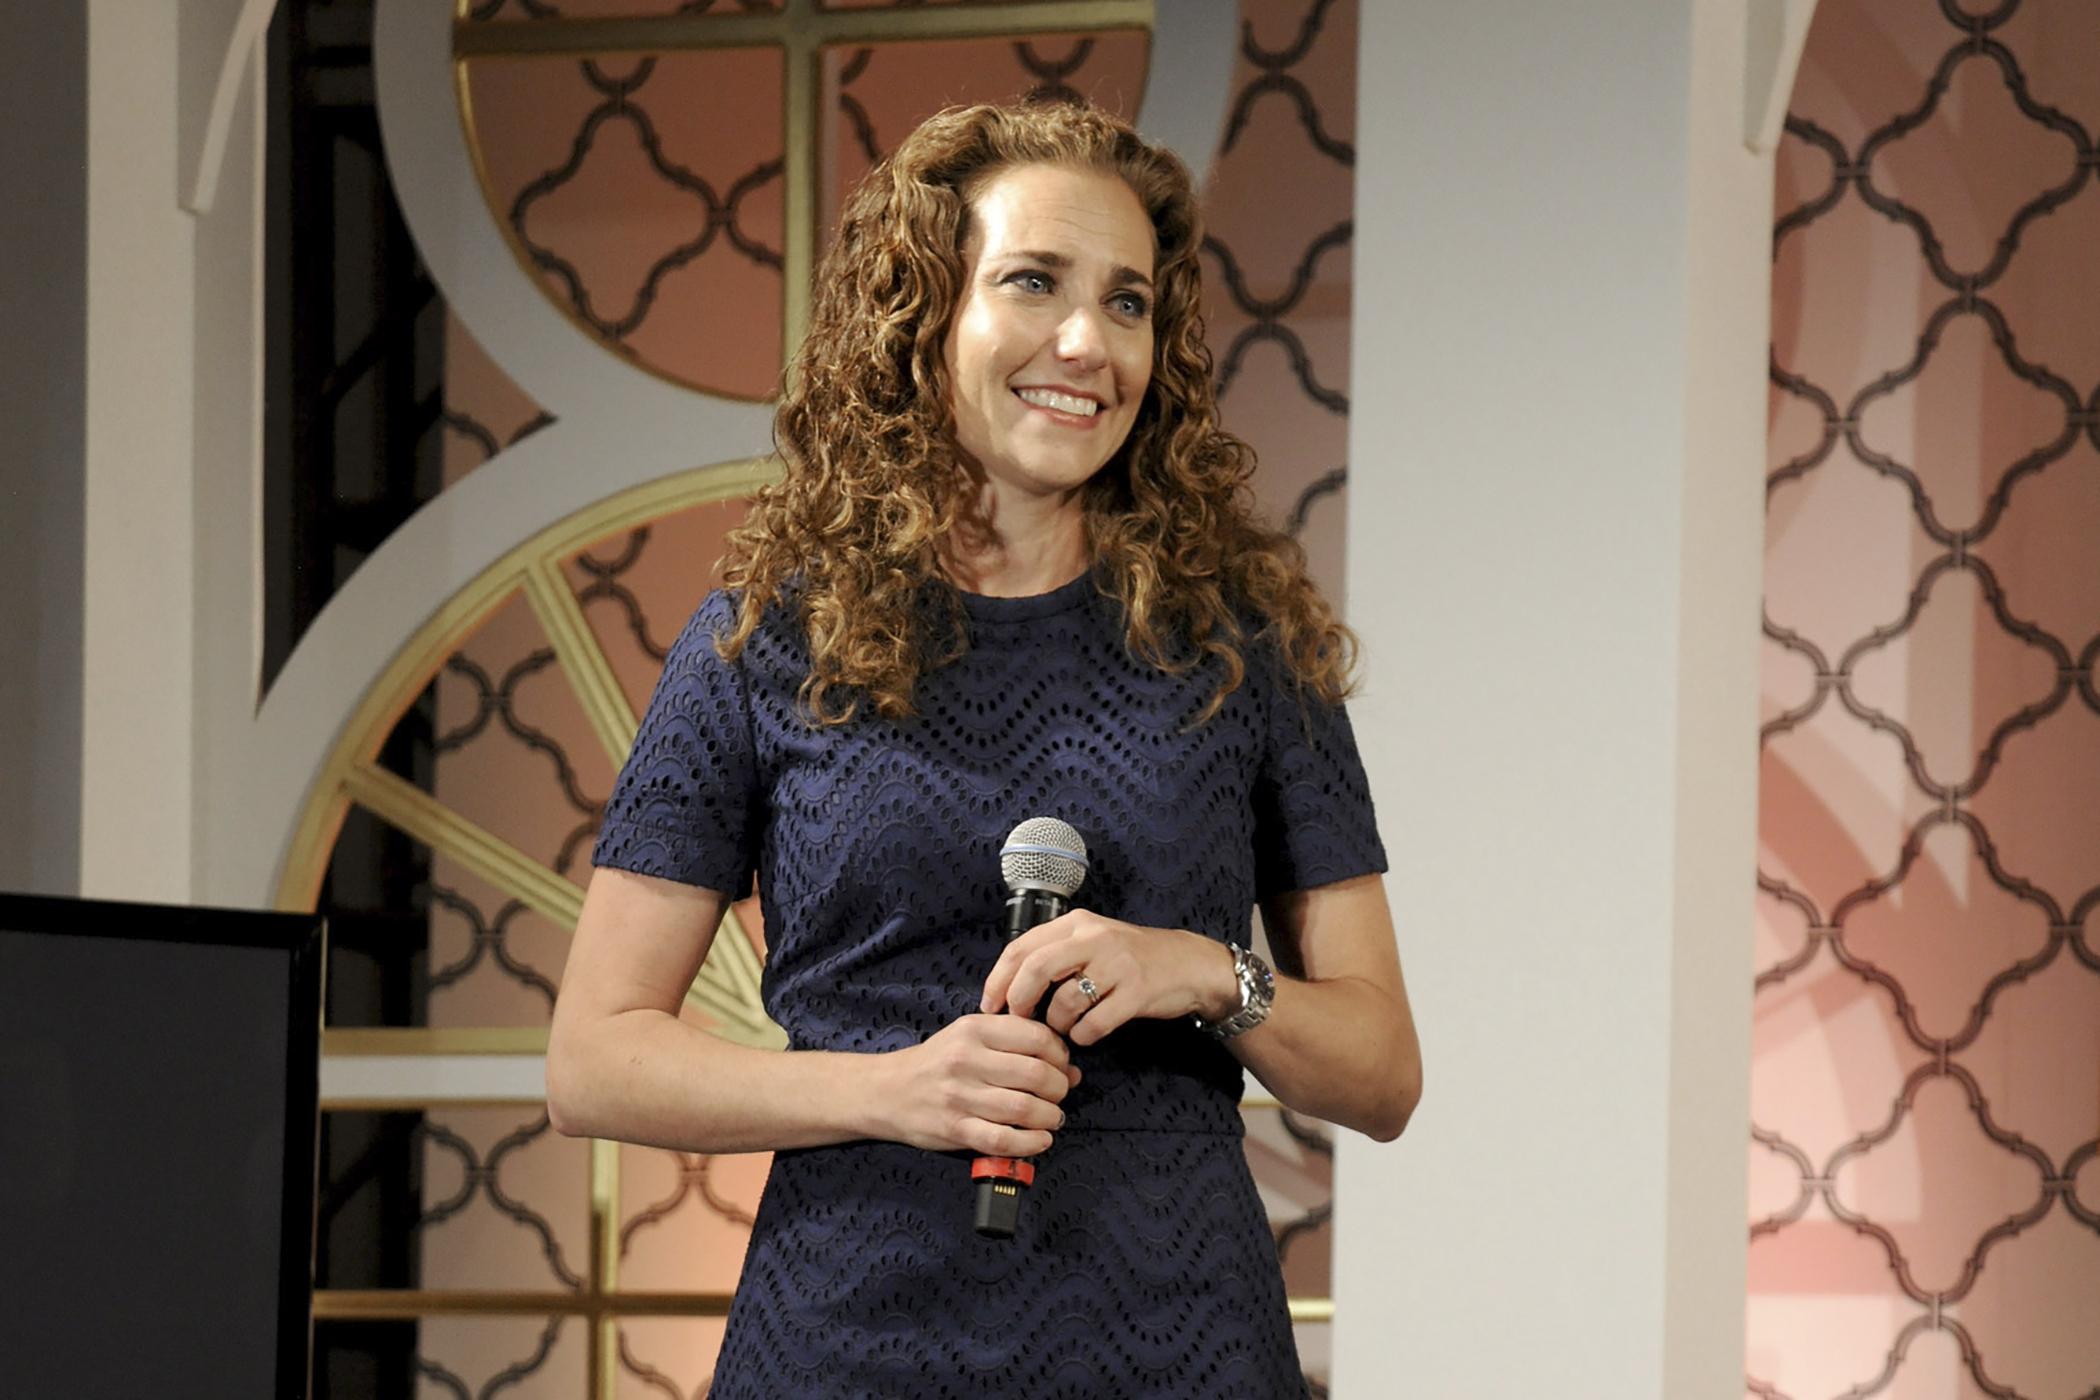 Lisa Sugar of POPSUGAR, at the Digital Content NewFronts presentation  in New York, 2014.